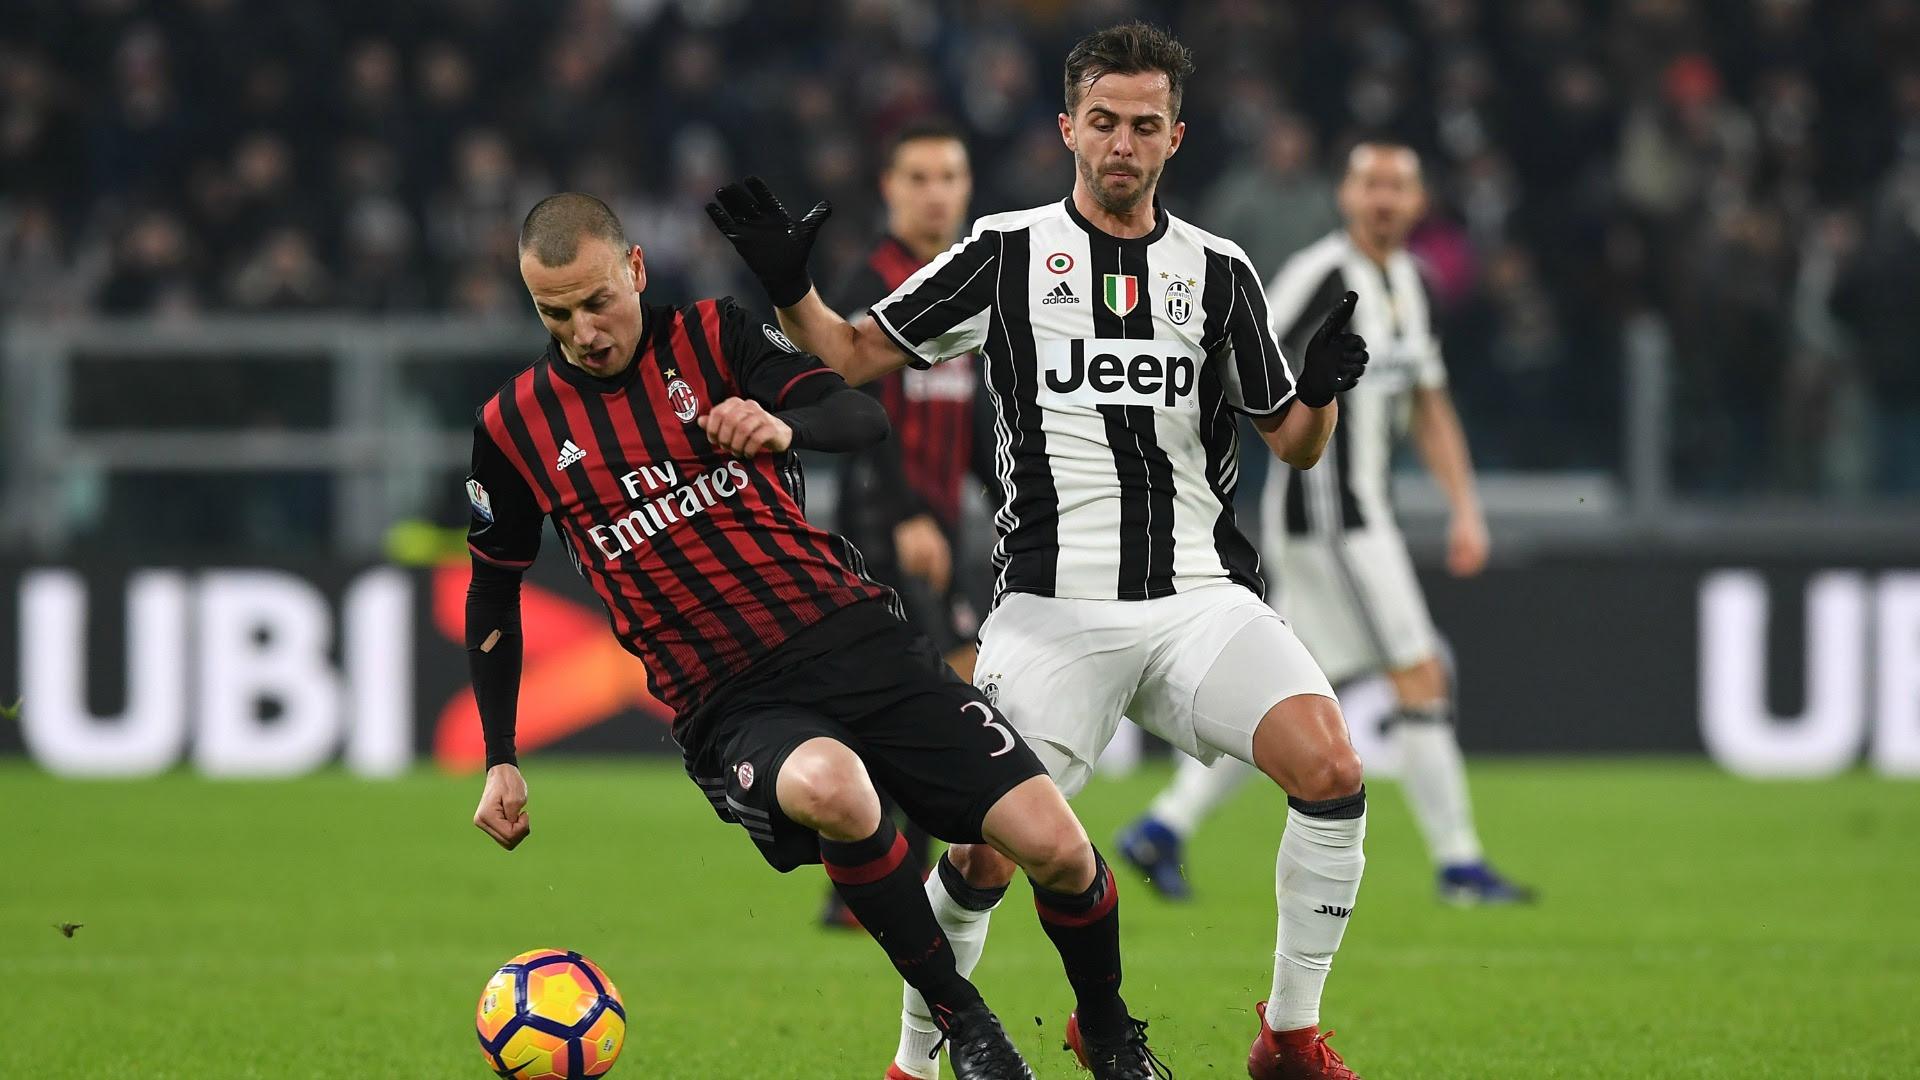 Juventus vs Milan - Match preview, team news and lineups ...